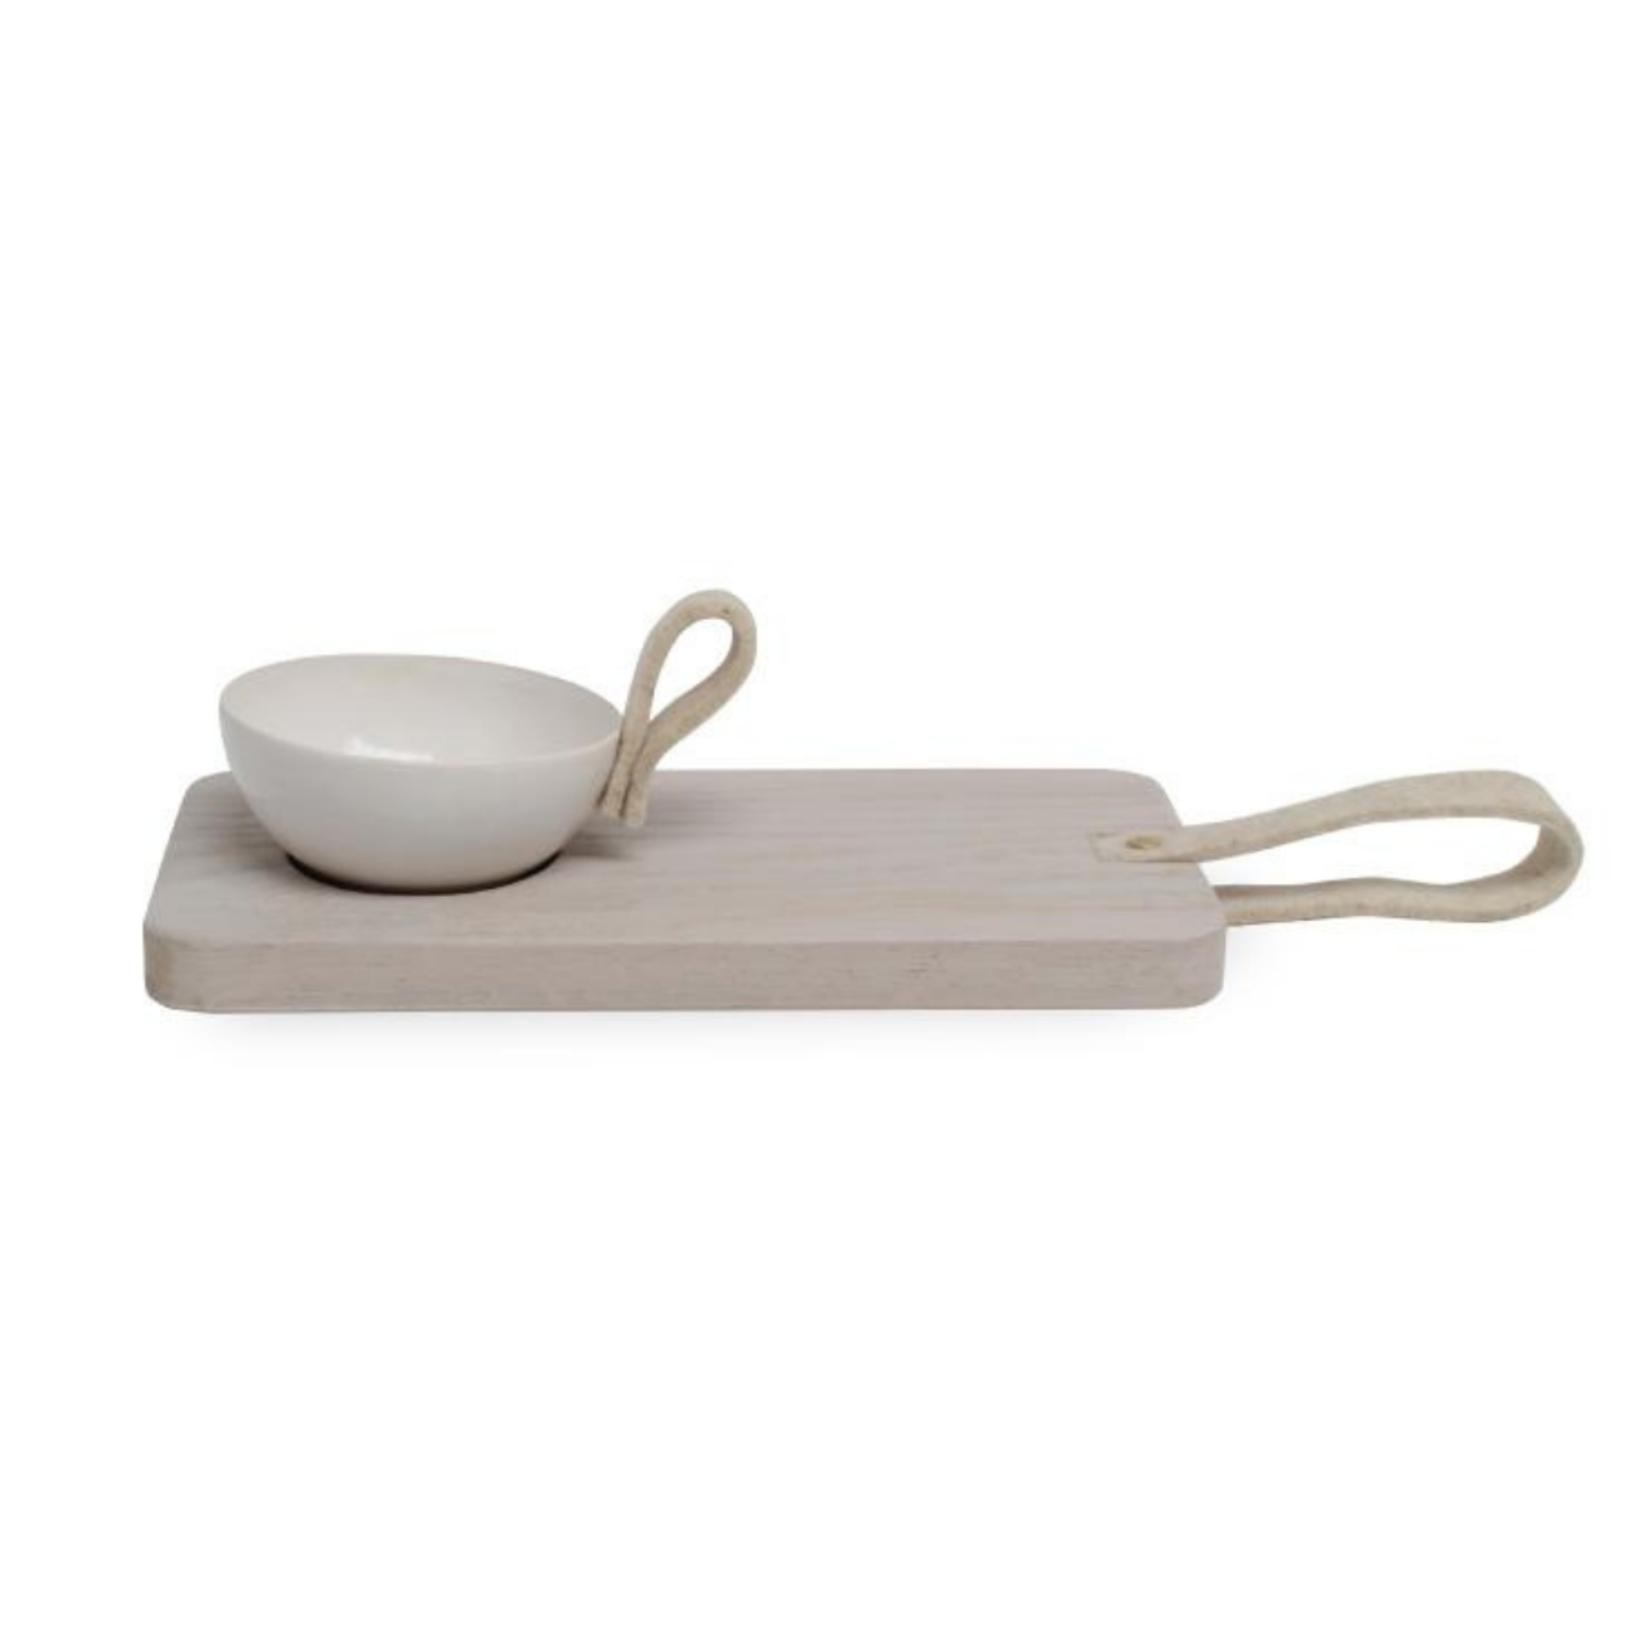 NADesign NADesign wooden cutting board - white